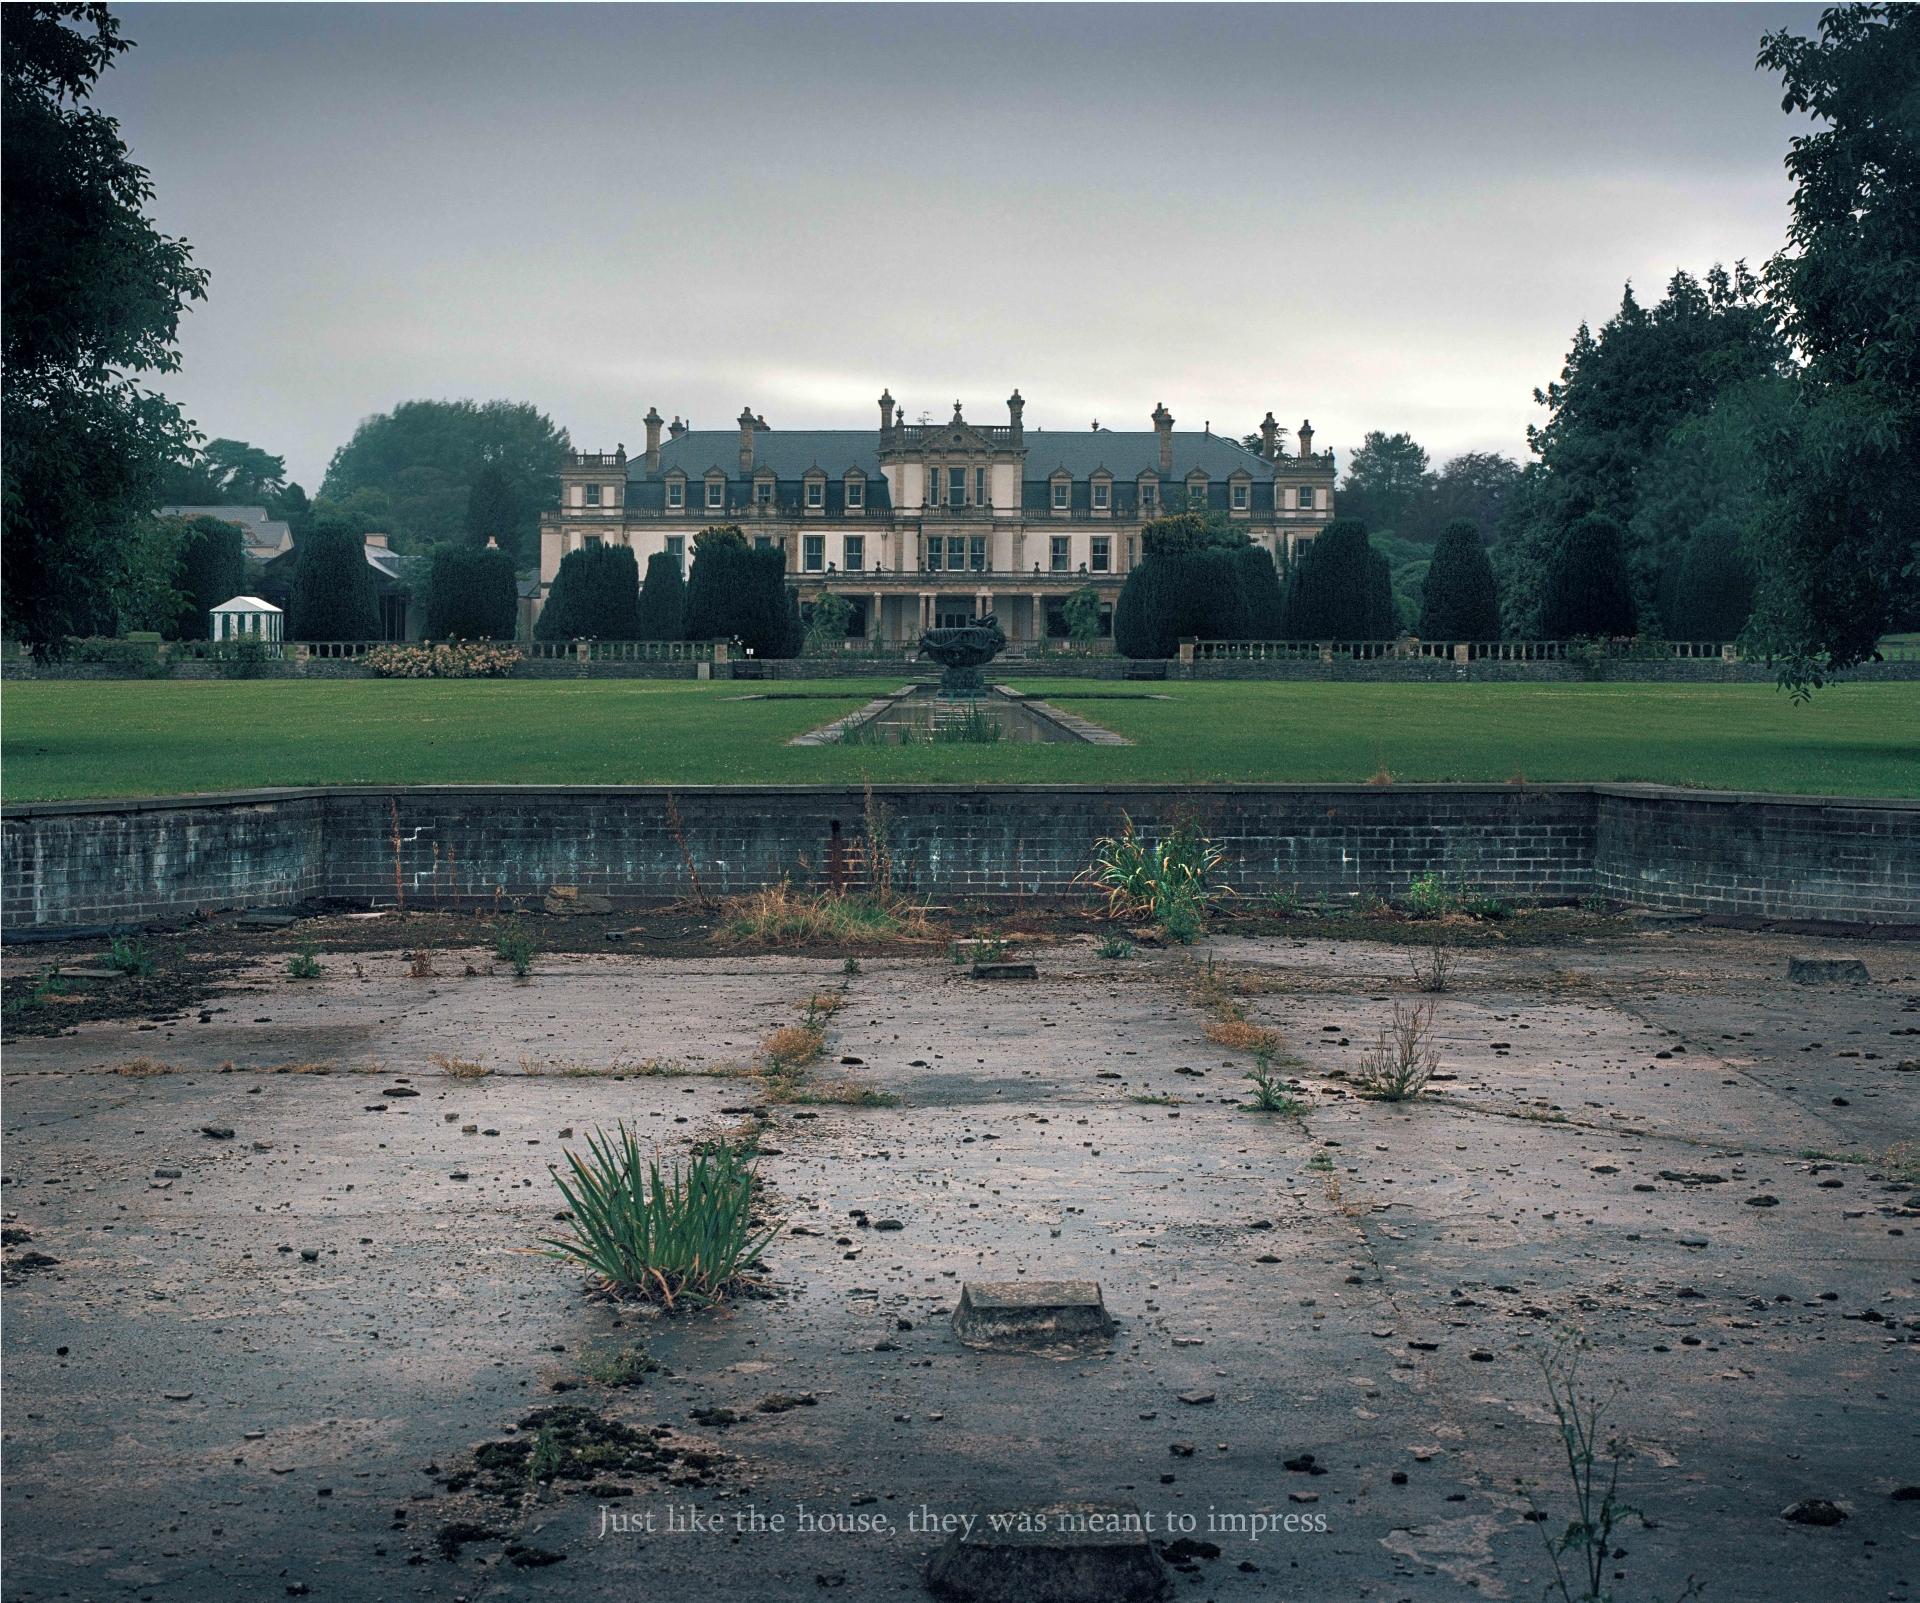 3_dyffryn-house-from-the-distance